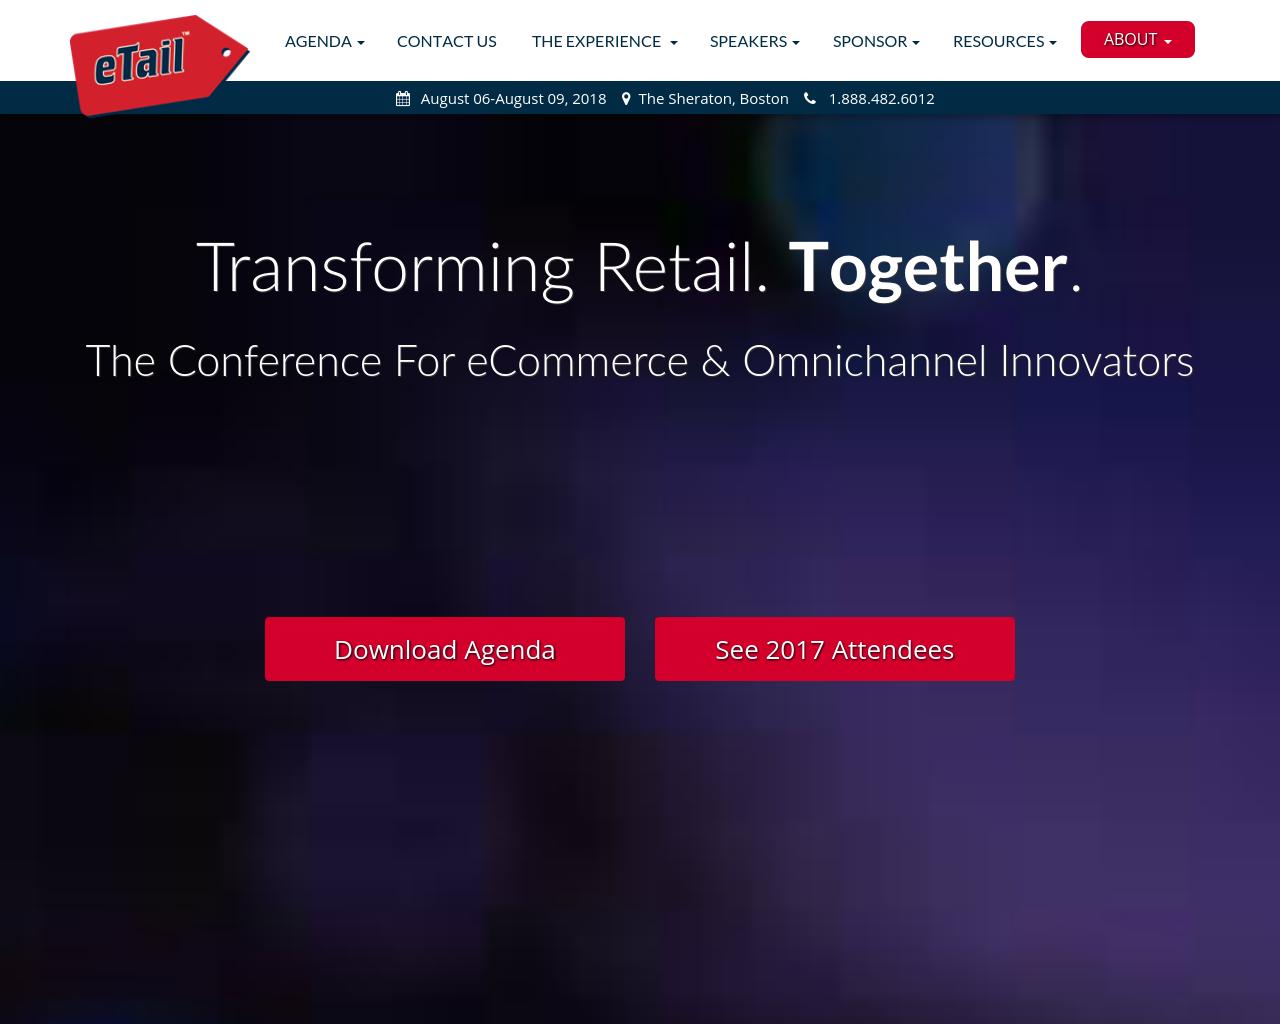 The-eTail-Blog-Advertising-Reviews-Pricing